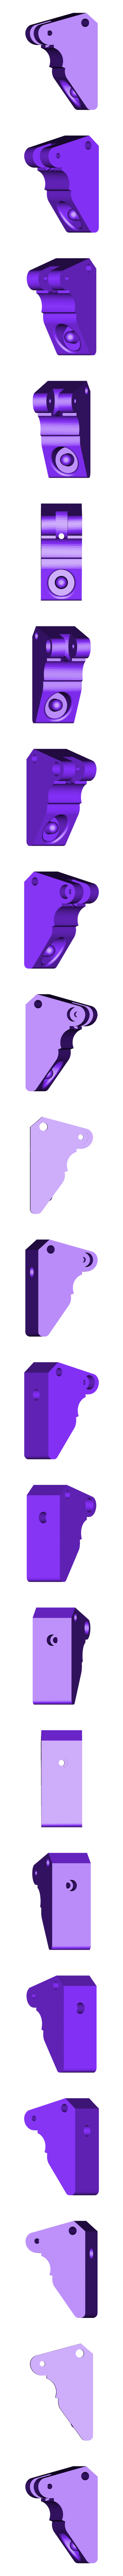 bras_extrudeur_dagoma_polyflex_by_steven.d.STL Download free STL file Discoeasy dagoma extruder arm for flexible filament • 3D printing model, seven7260